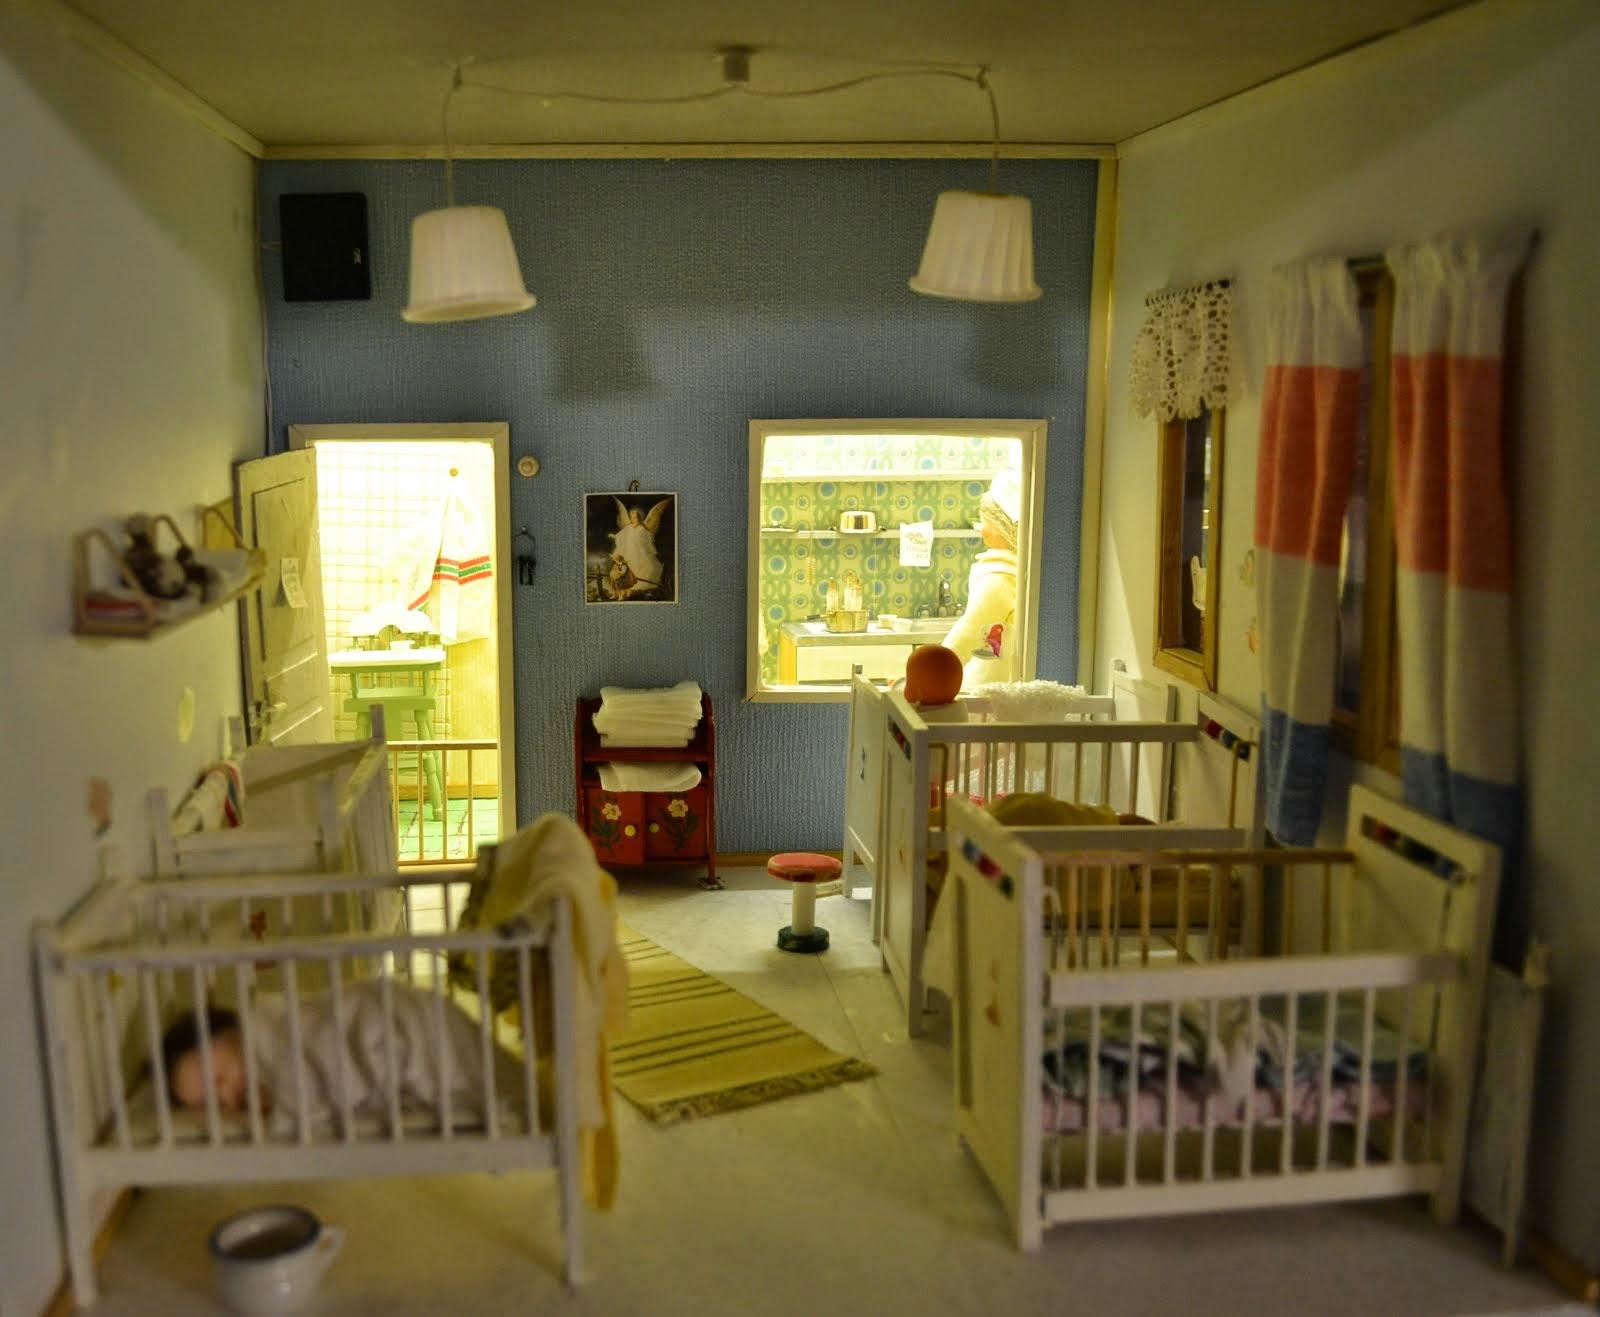 Lastenhuone -roomboxi